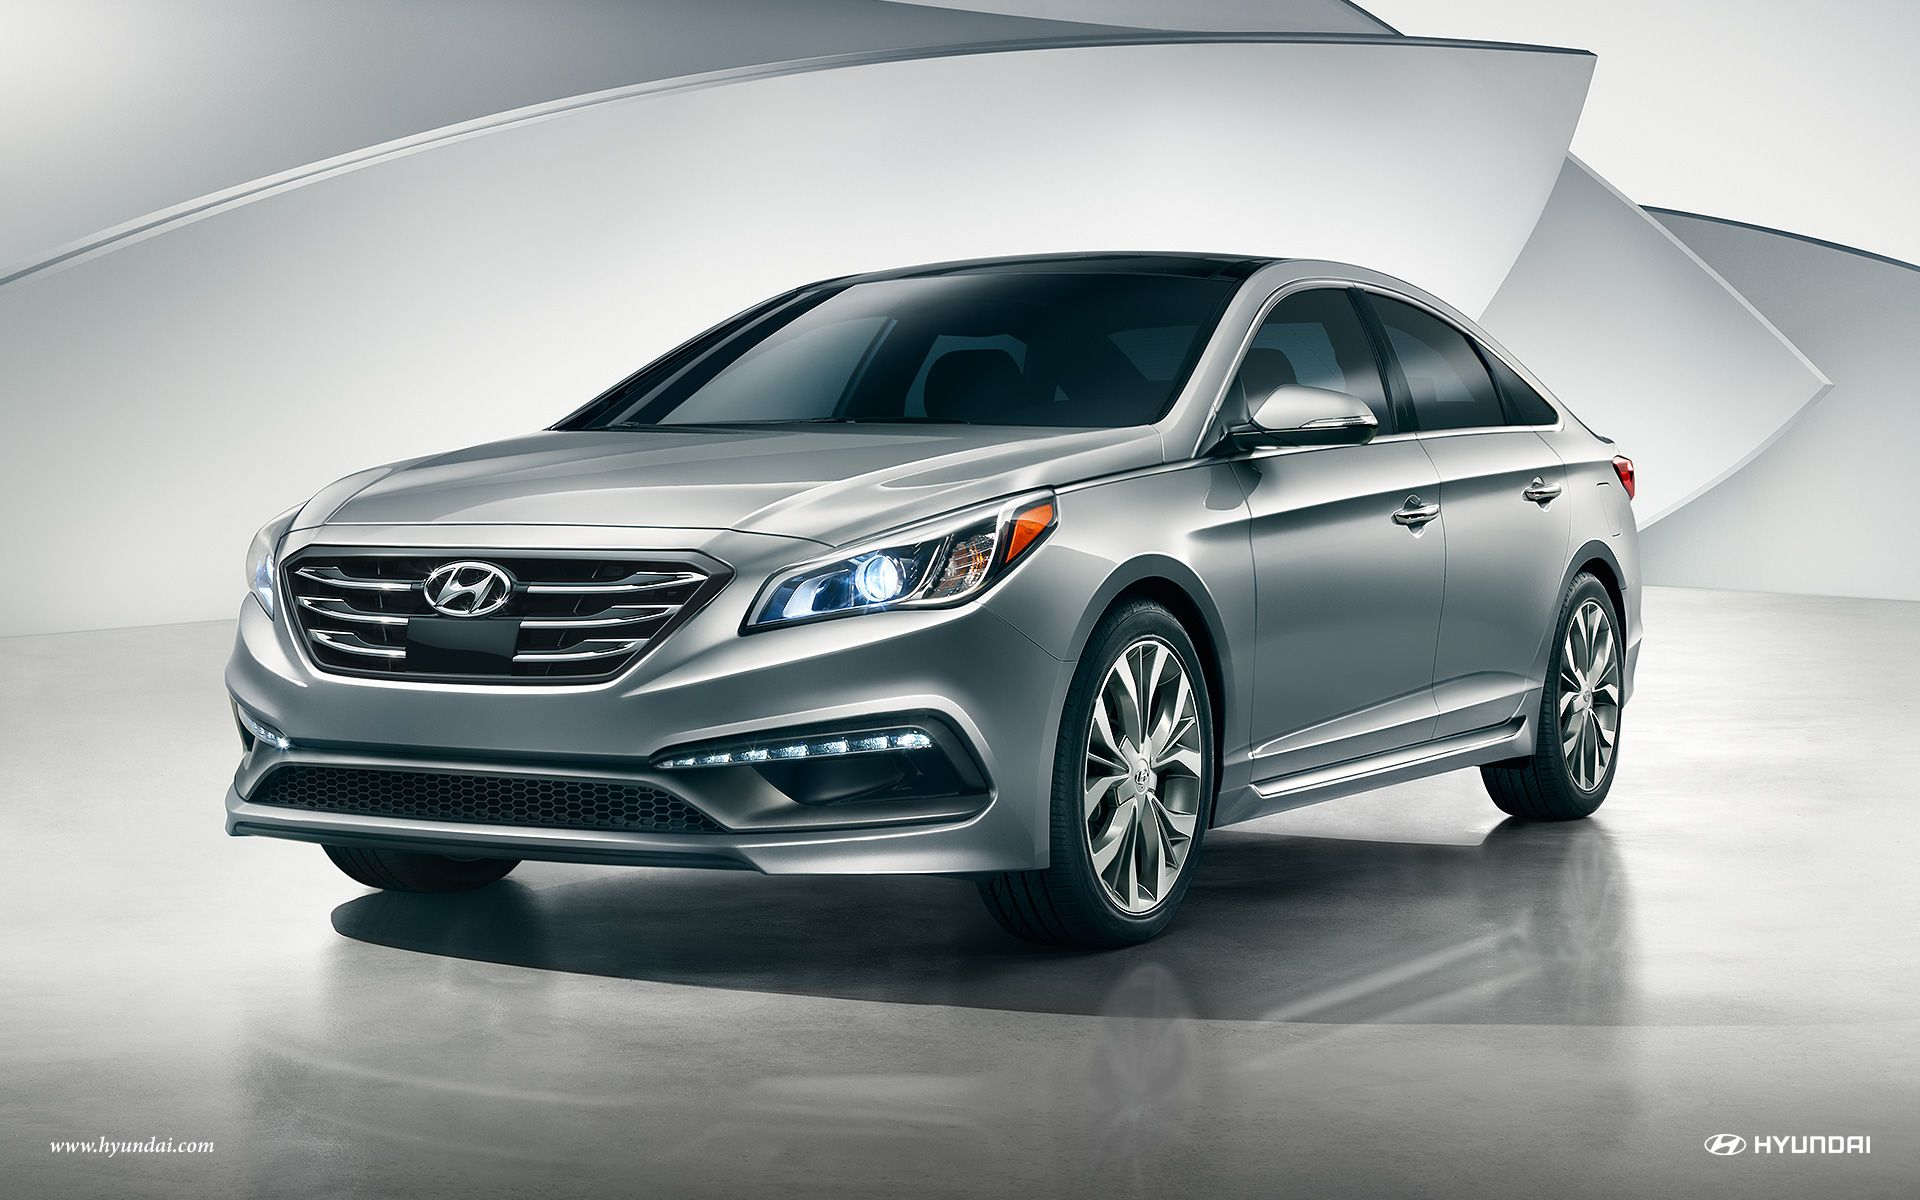 Pin on New Model Release 2017 Hyundai Sonata